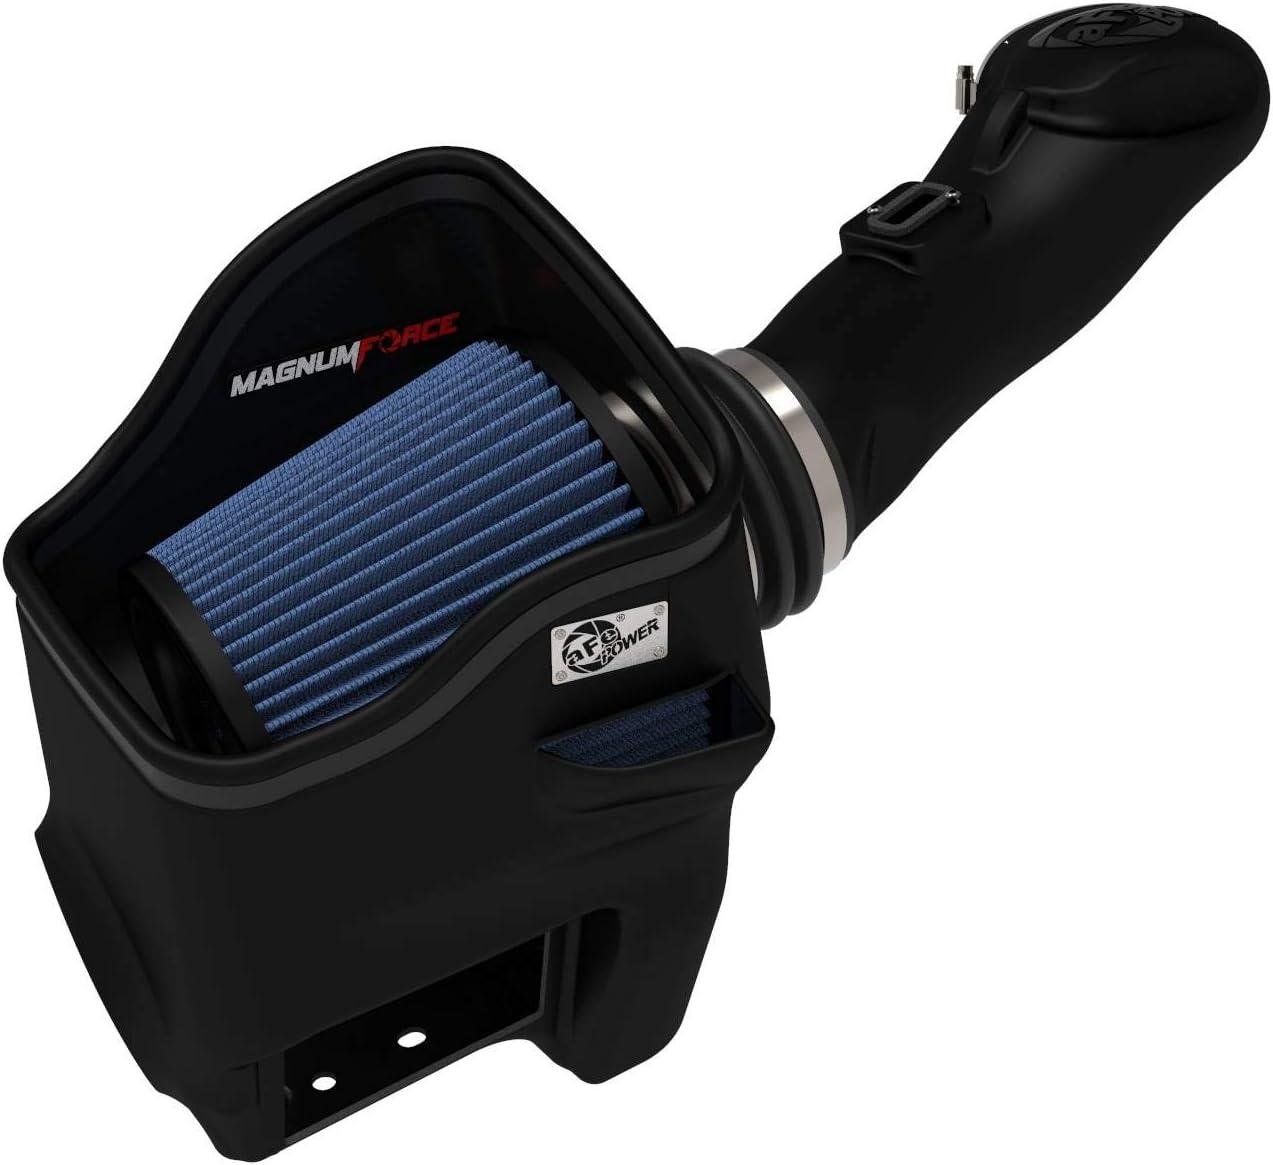 aFe Power Magnum Performance Intake System